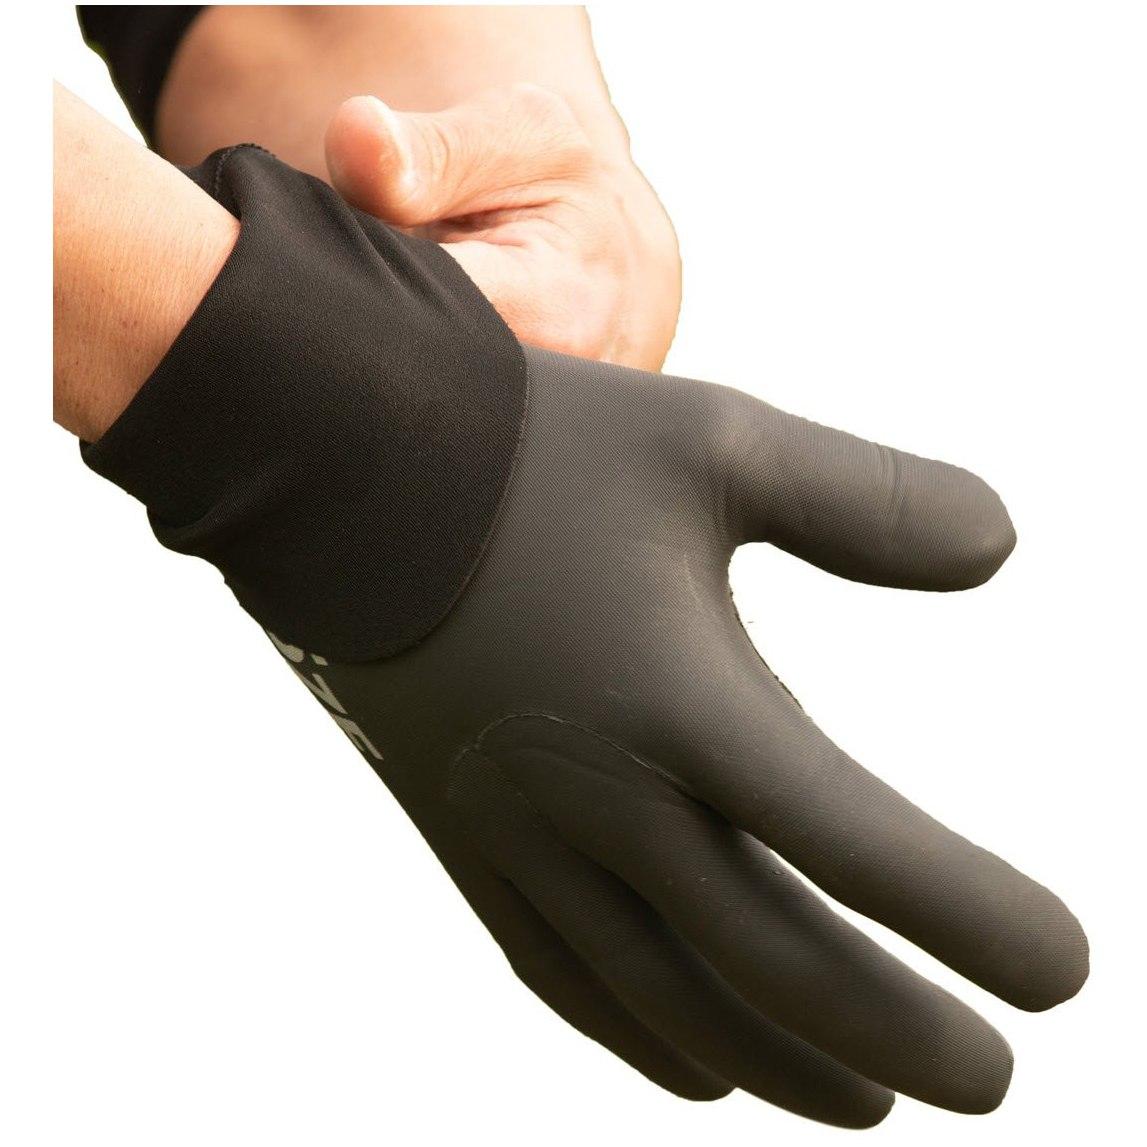 Bild von veloToze Waterproof Cycling Glove Handschuhe - black